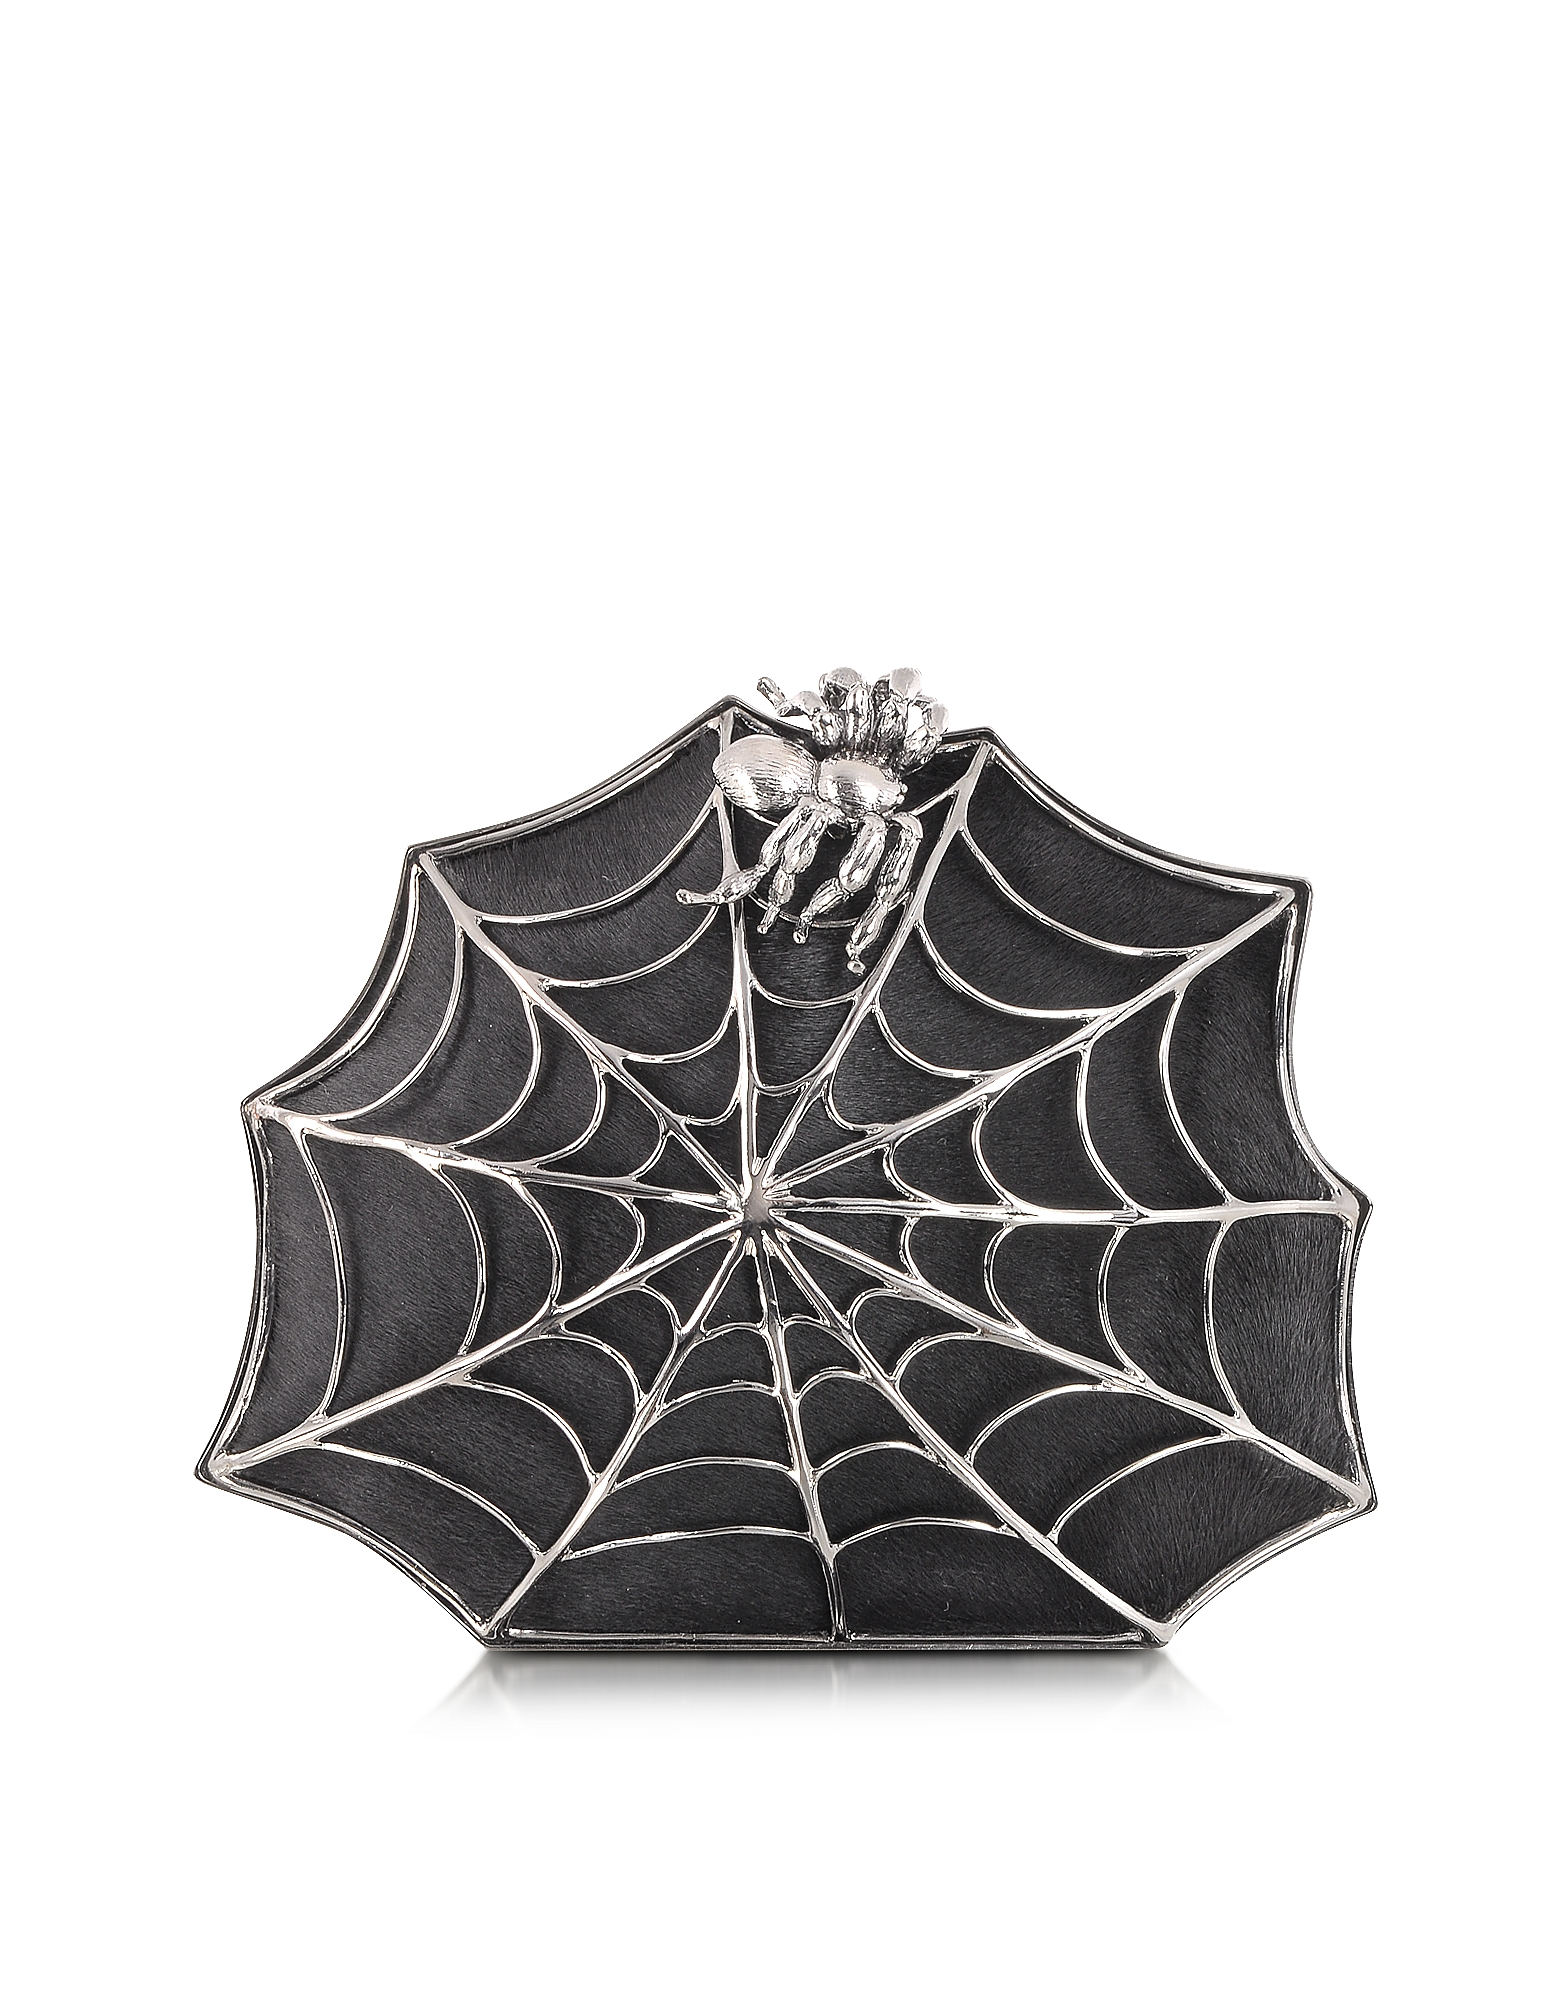 Bernard Delettrez Handbags, Black Ponyhair Clutch w/Web and Spider